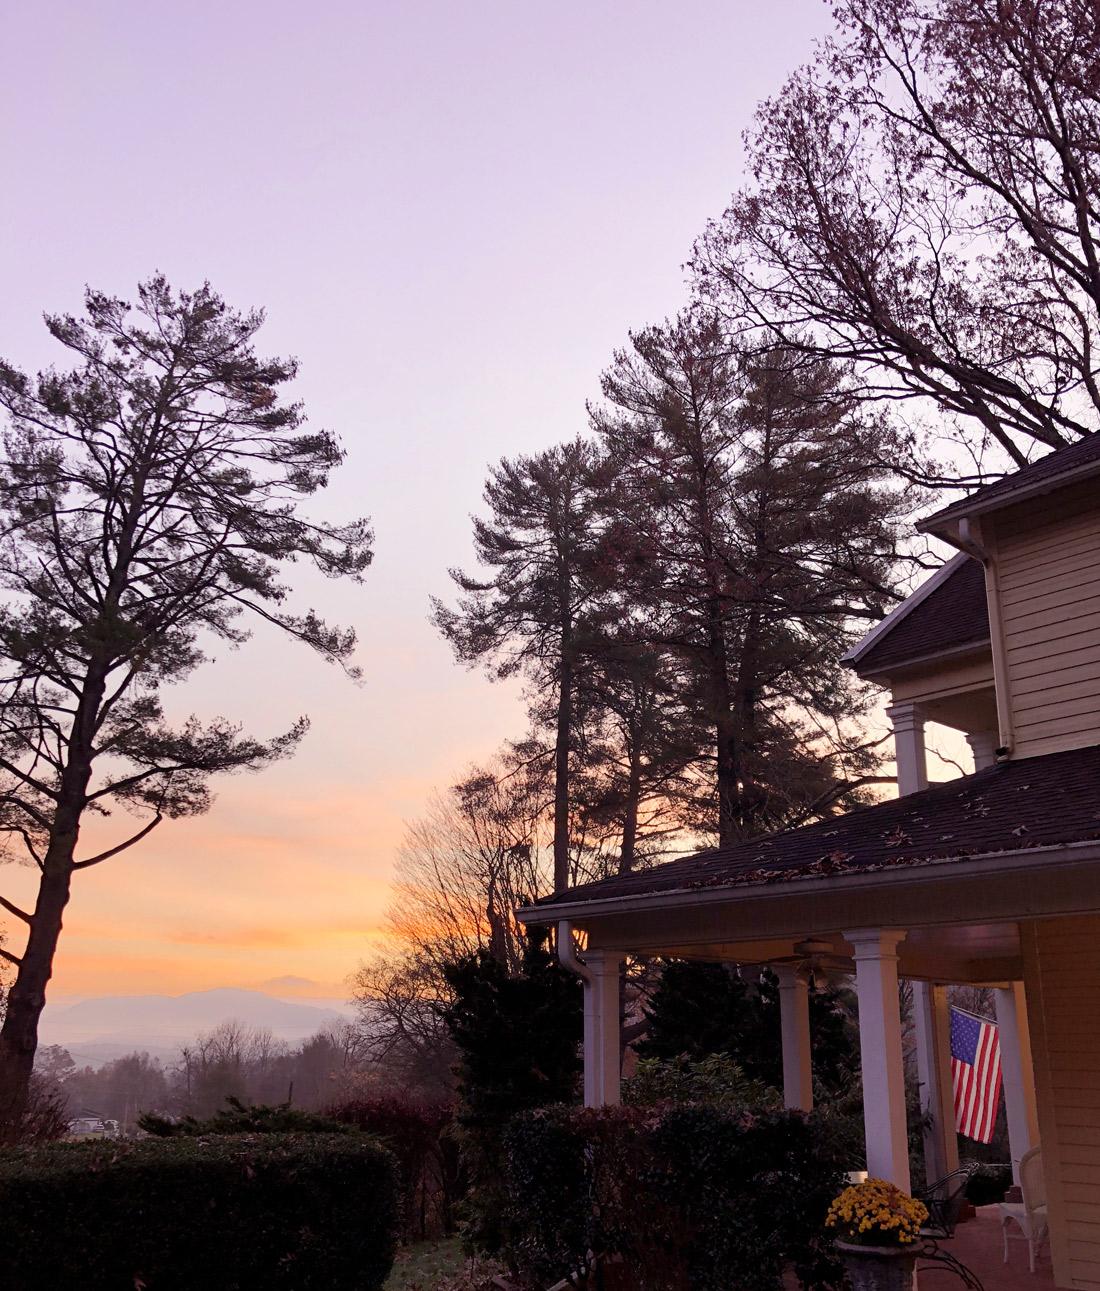 Bag-at-you---Travel-blog---Yellow-House-on-Plott-Creek-Rd---Sunrise